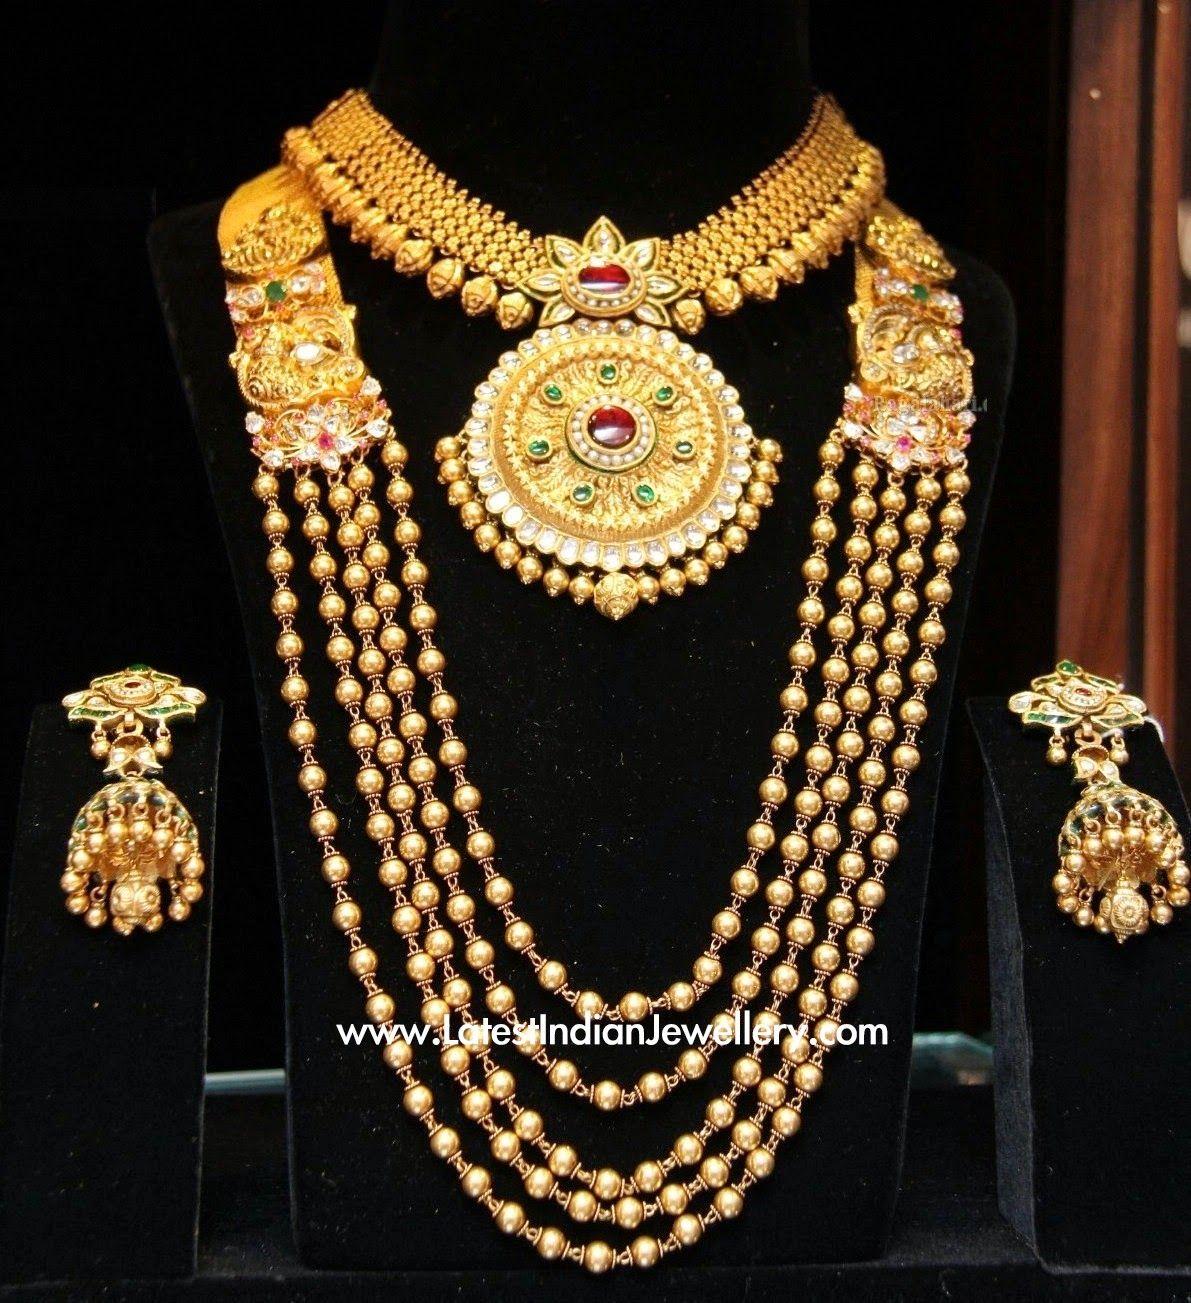 Bridal Diamond Necklace And Haram Set: Latest Gold Necklace And Haram Set